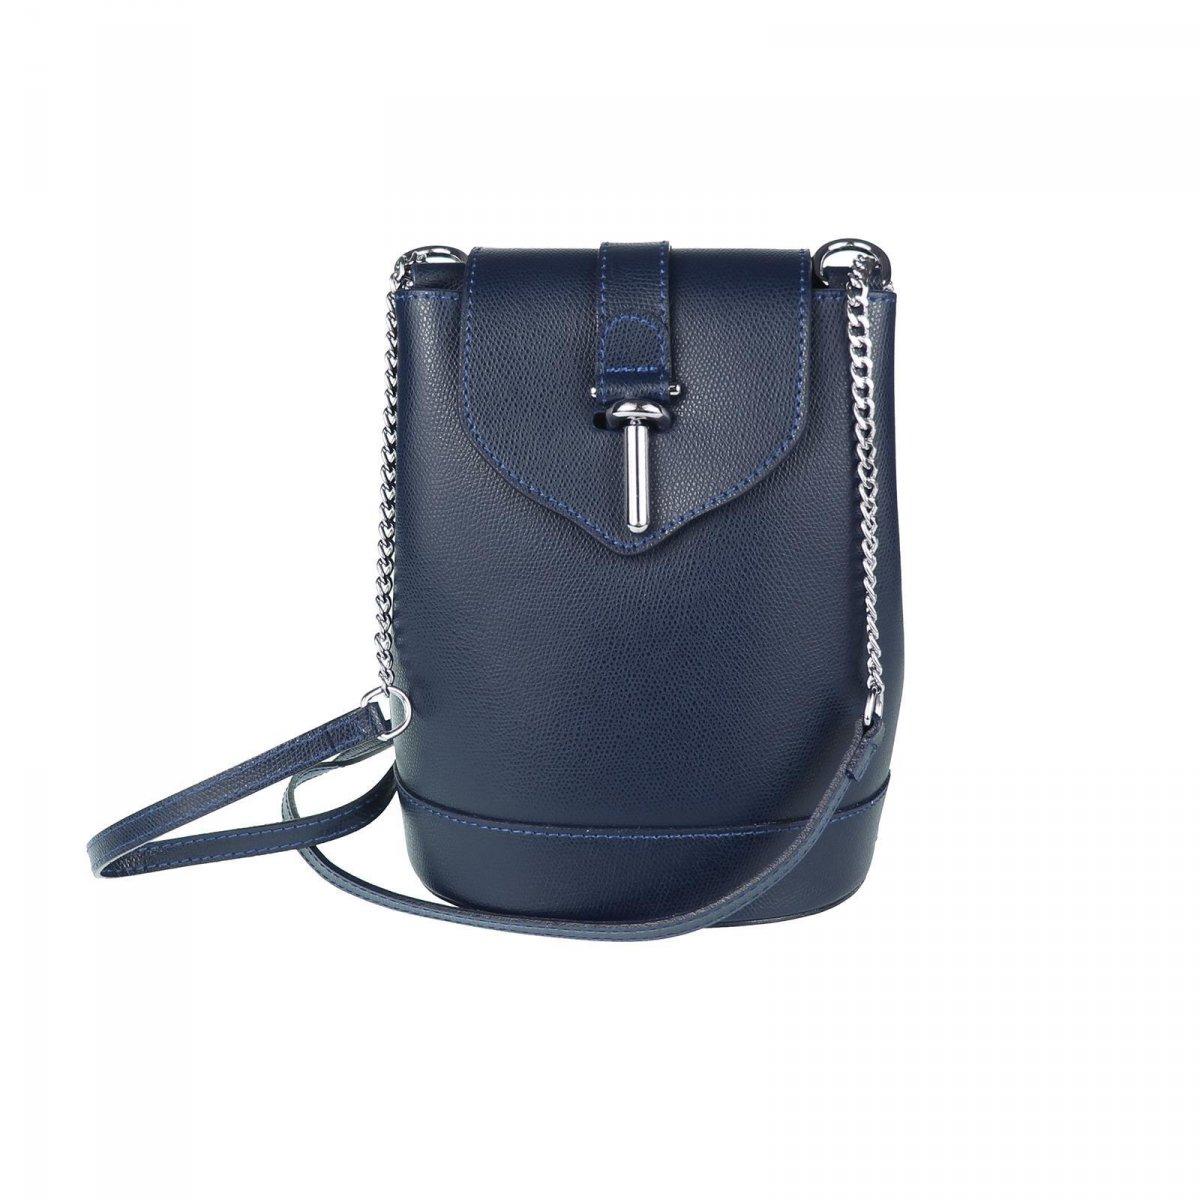 obc ledertasche damen tasche 2in1 handtasche kette rucksack umh ngetasche schultertas. Black Bedroom Furniture Sets. Home Design Ideas